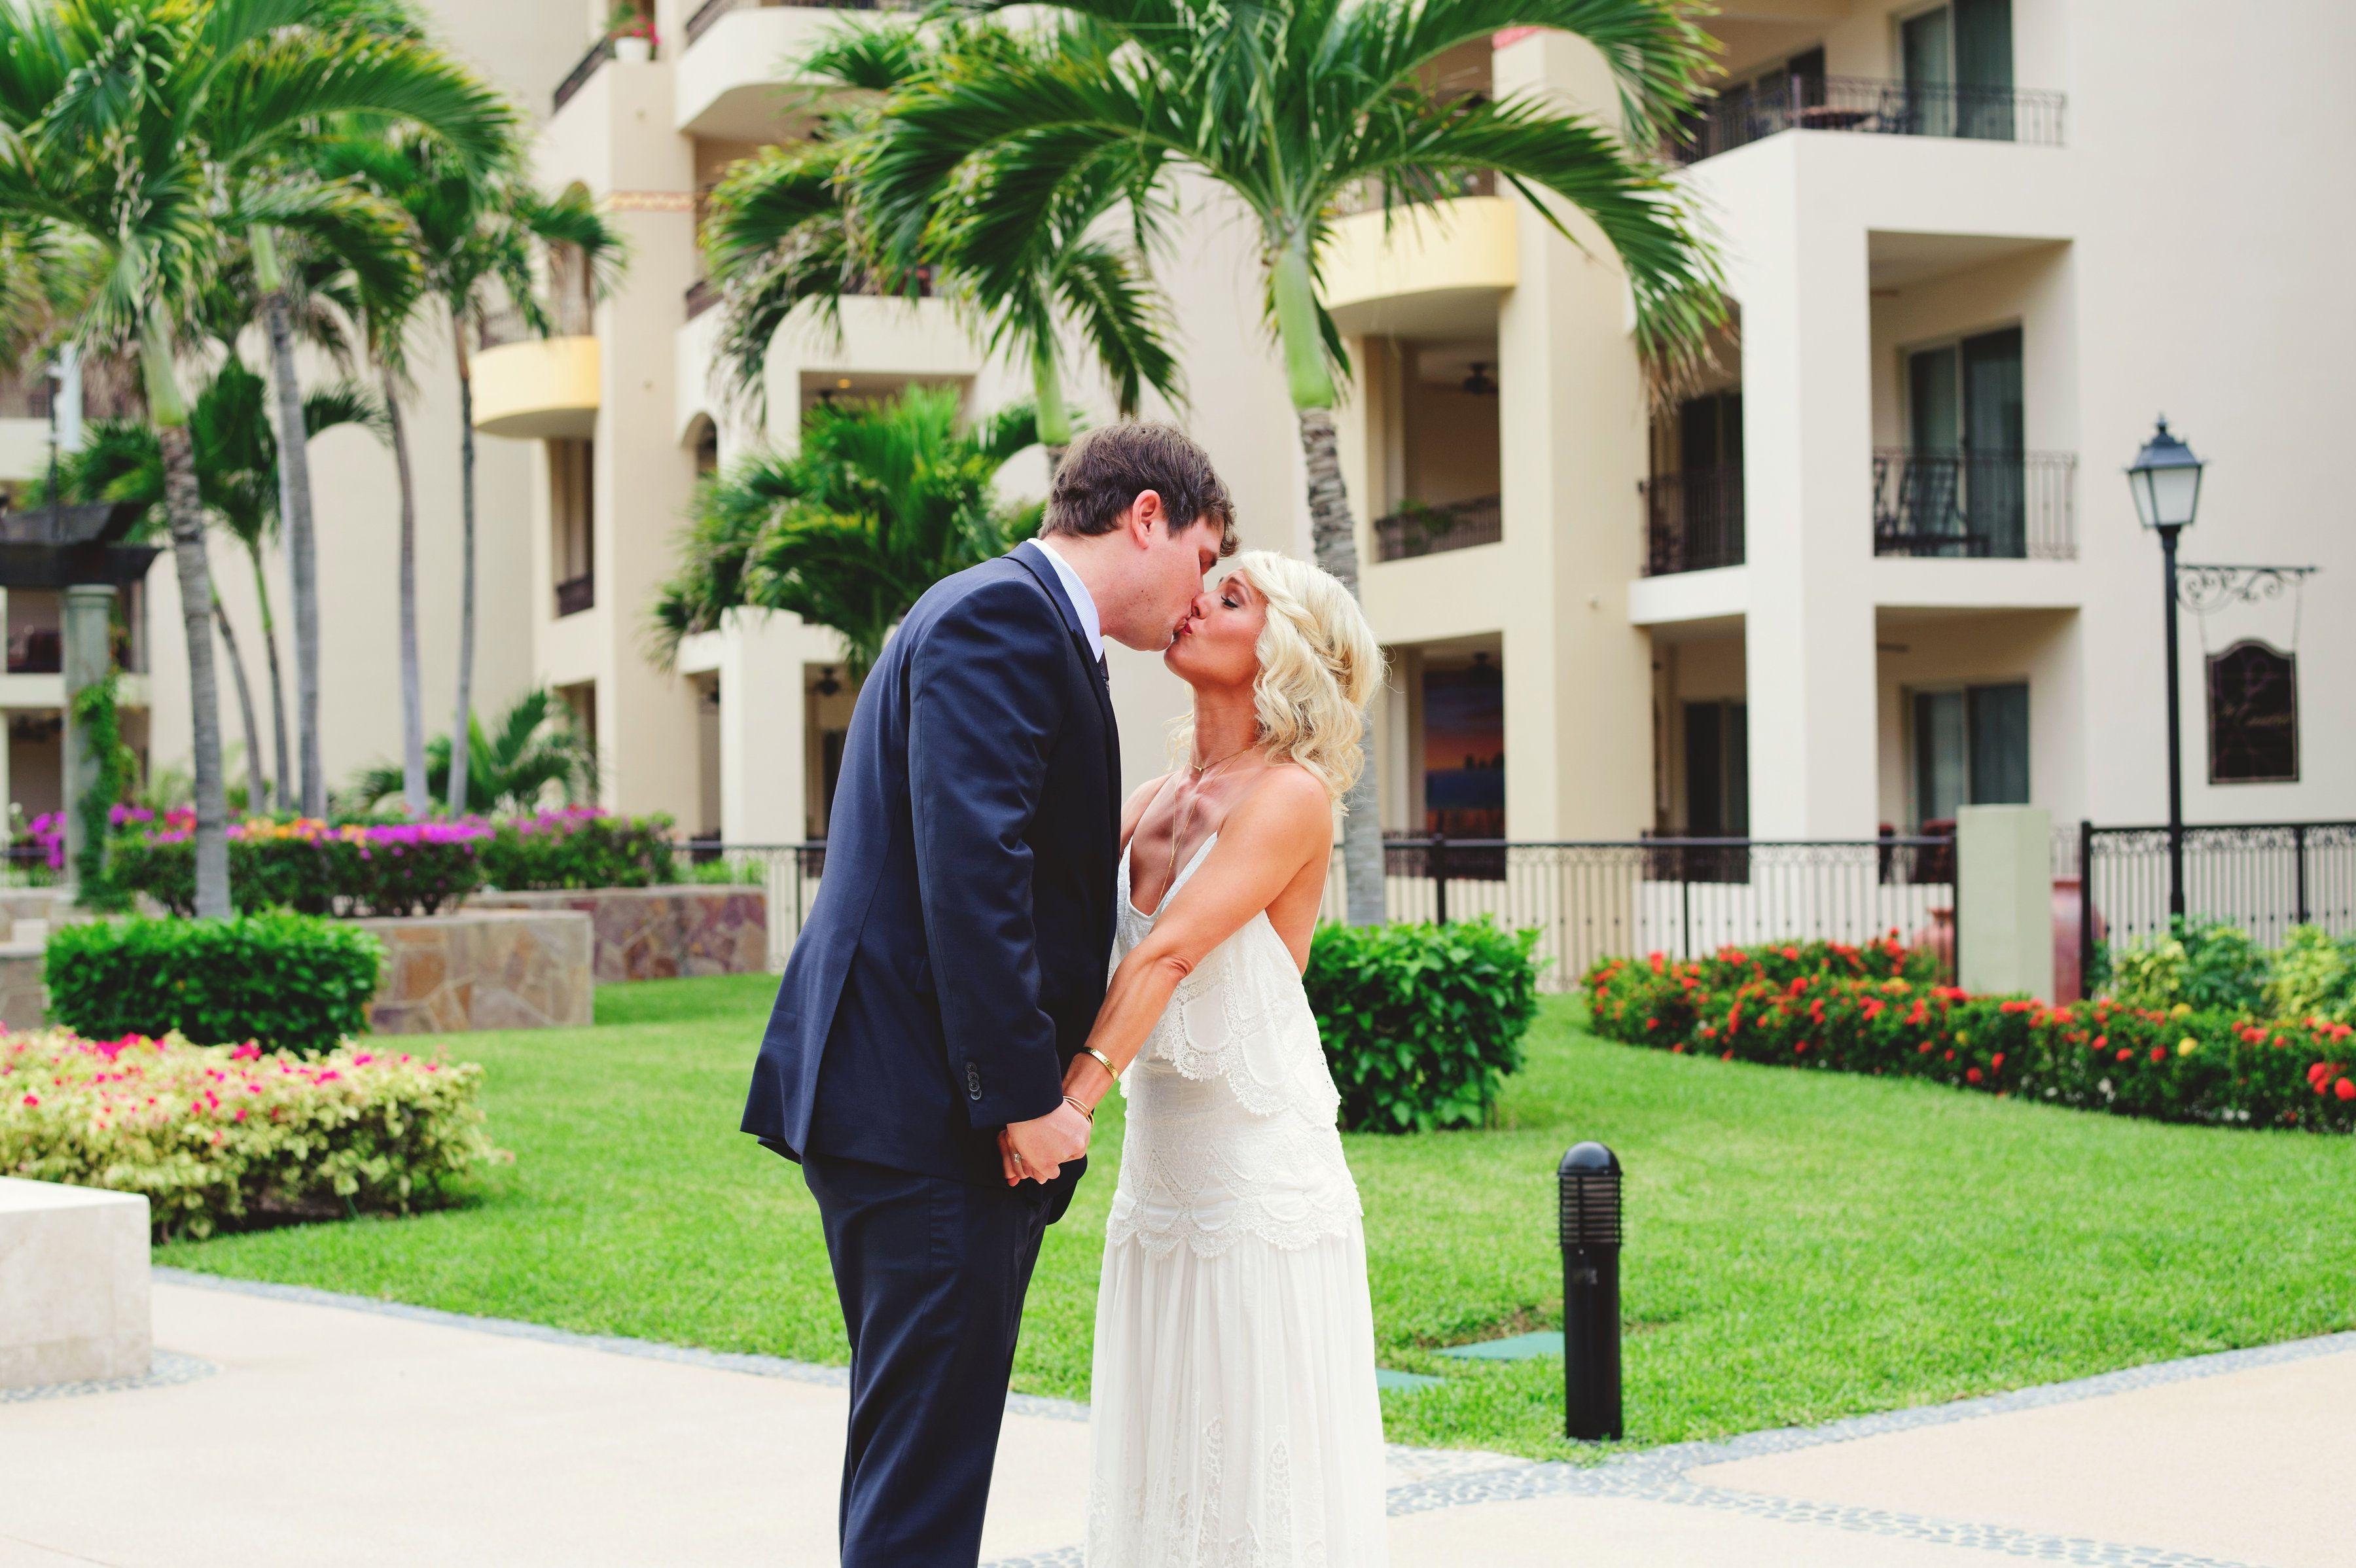 Bride and groom doing First look at Villa la Estancia